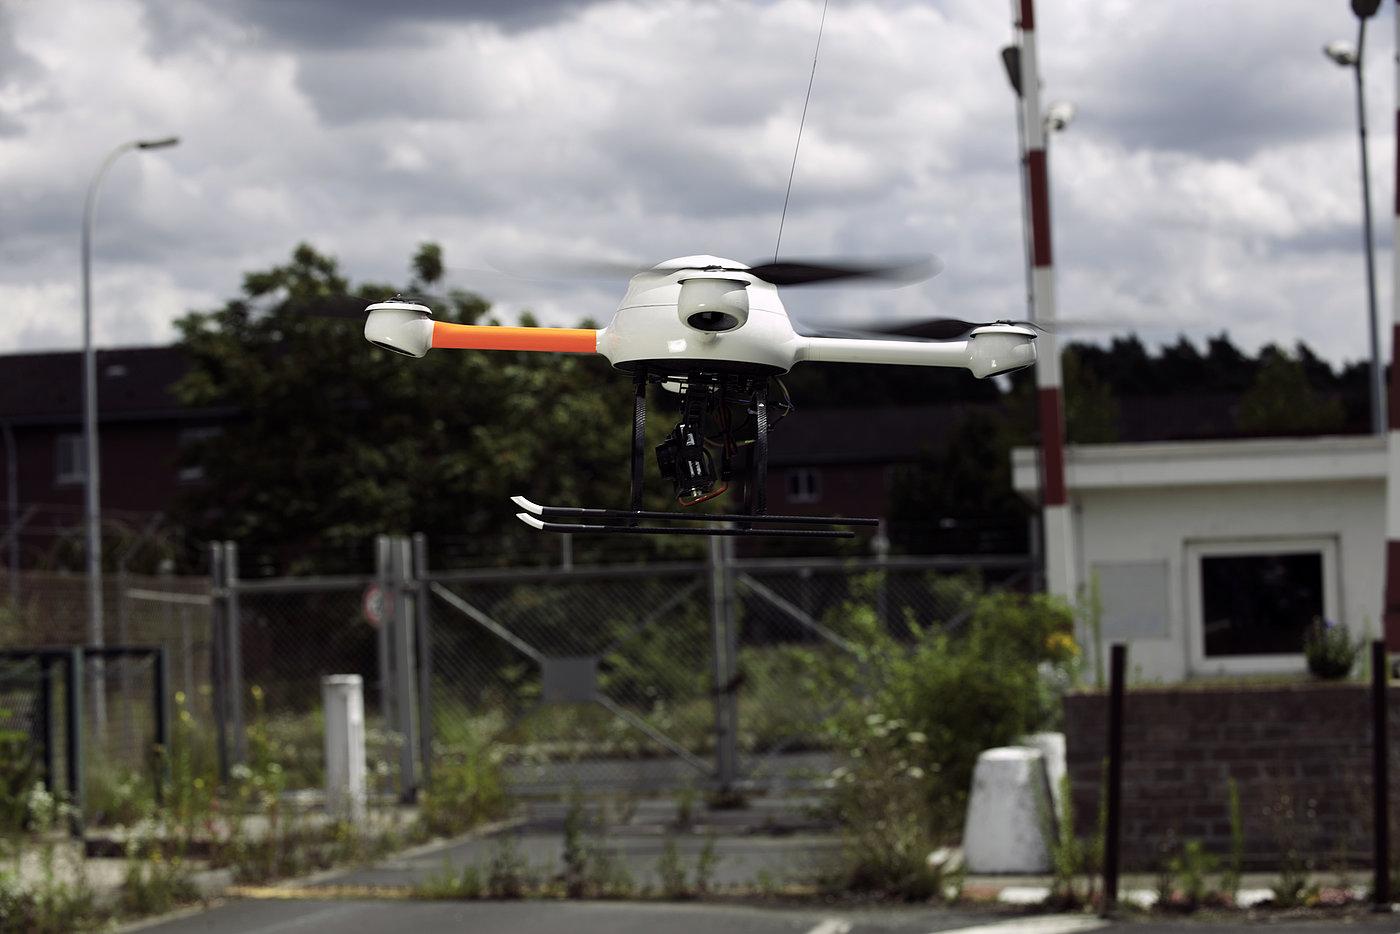 UAV for civil security: police drones, traffic control